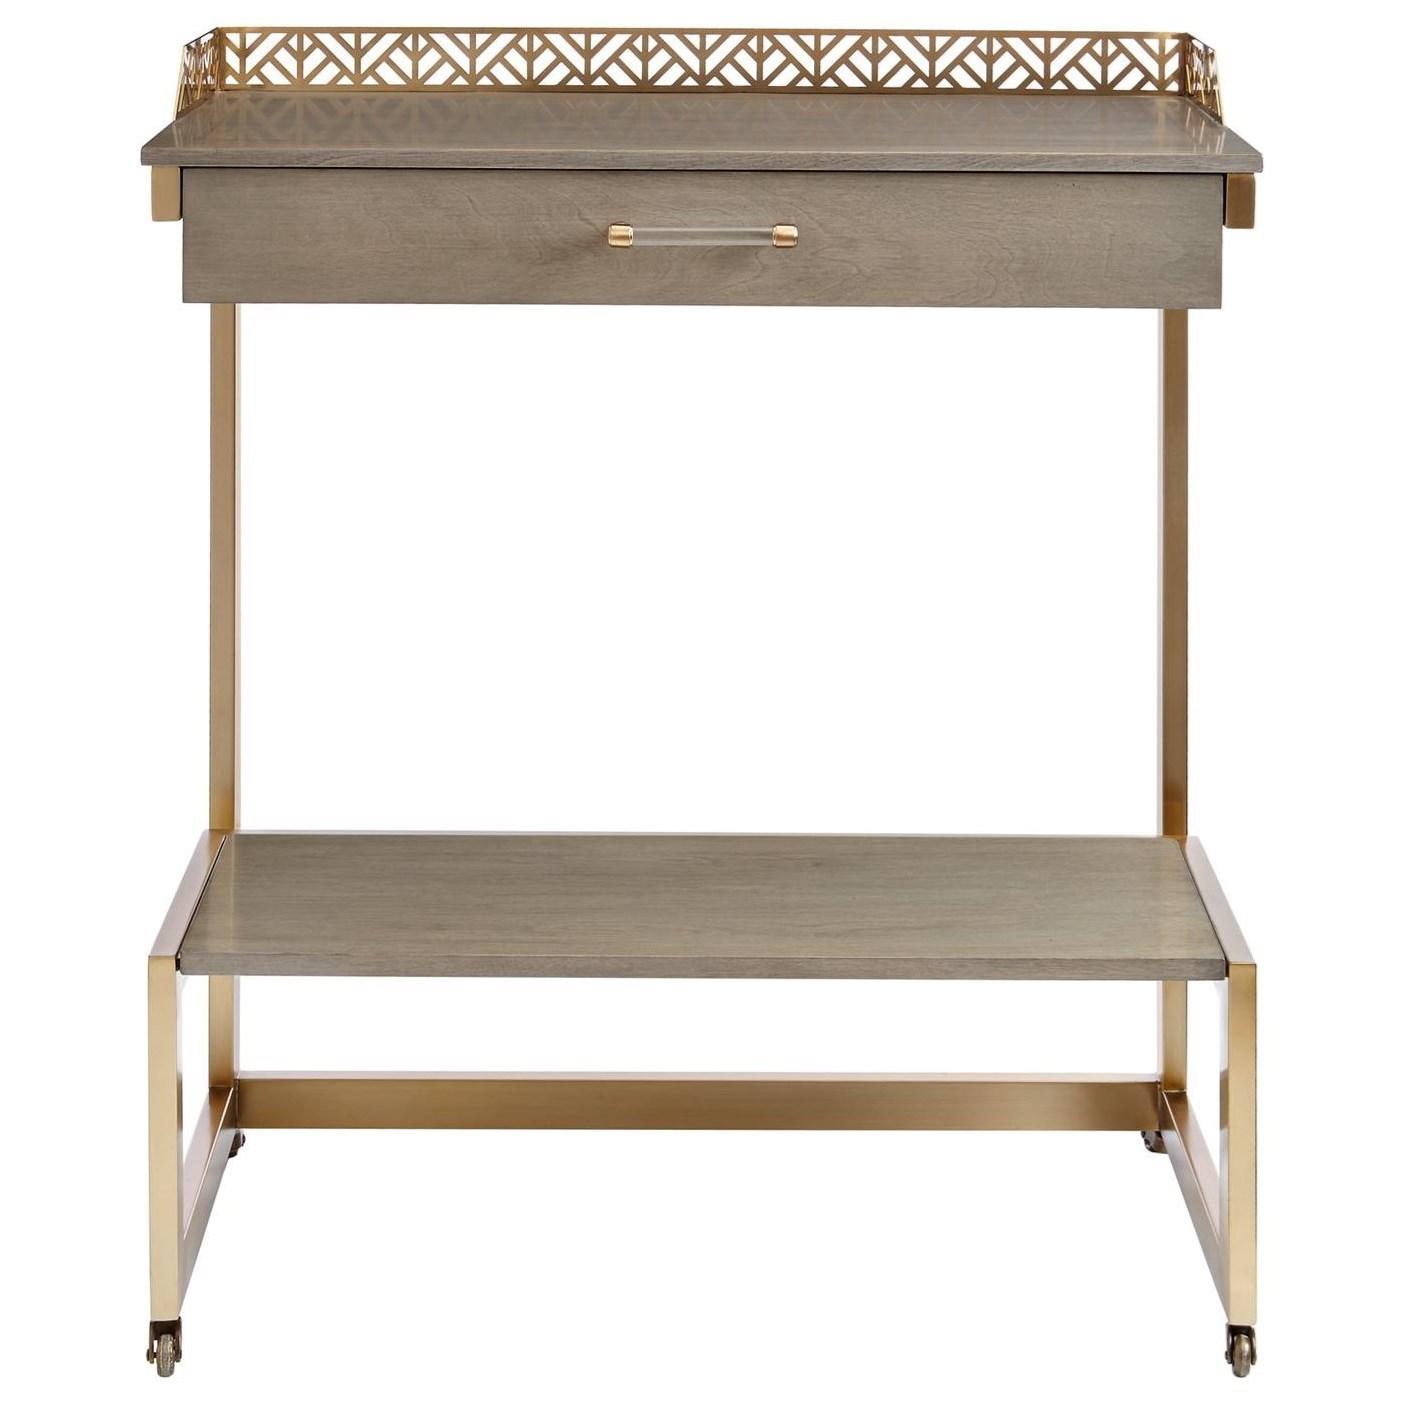 Stanley Furniture Coastal Living Oasis Catalina Bar Cart - Item Number: 527-61-08